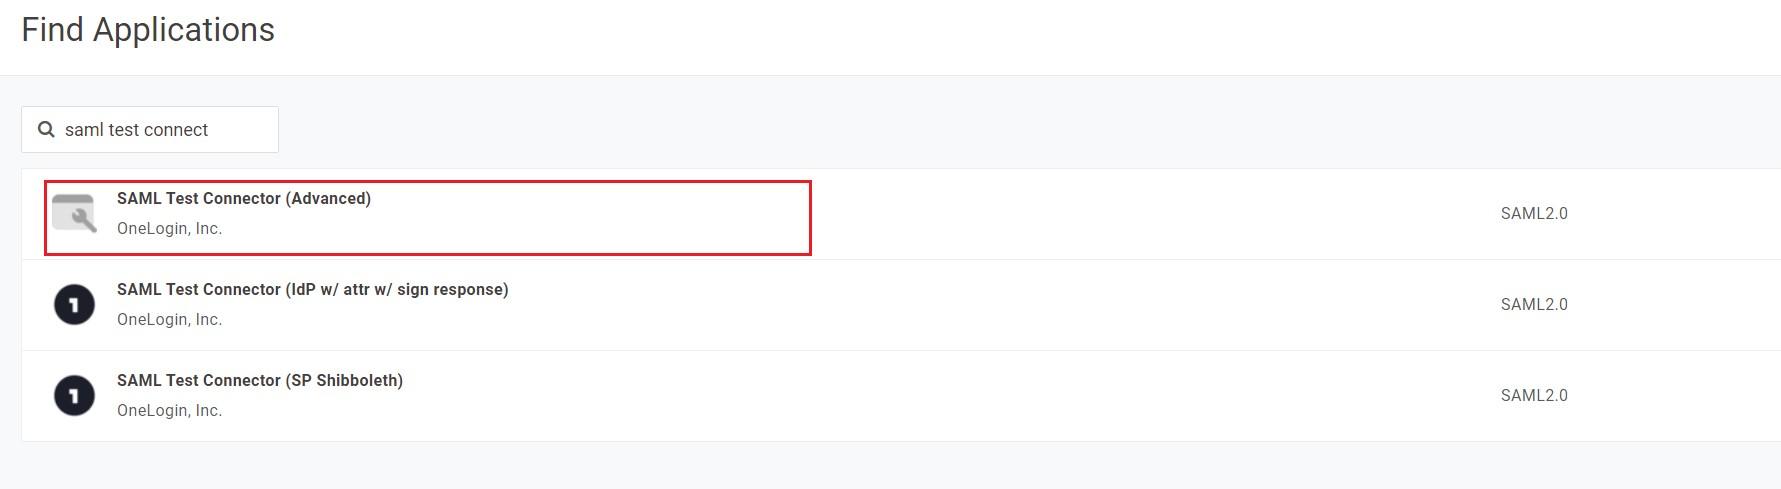 SAML Single Sign On (SSO) using Onelogin Identity Provider,Onelogin SSO login, Find SAML Application